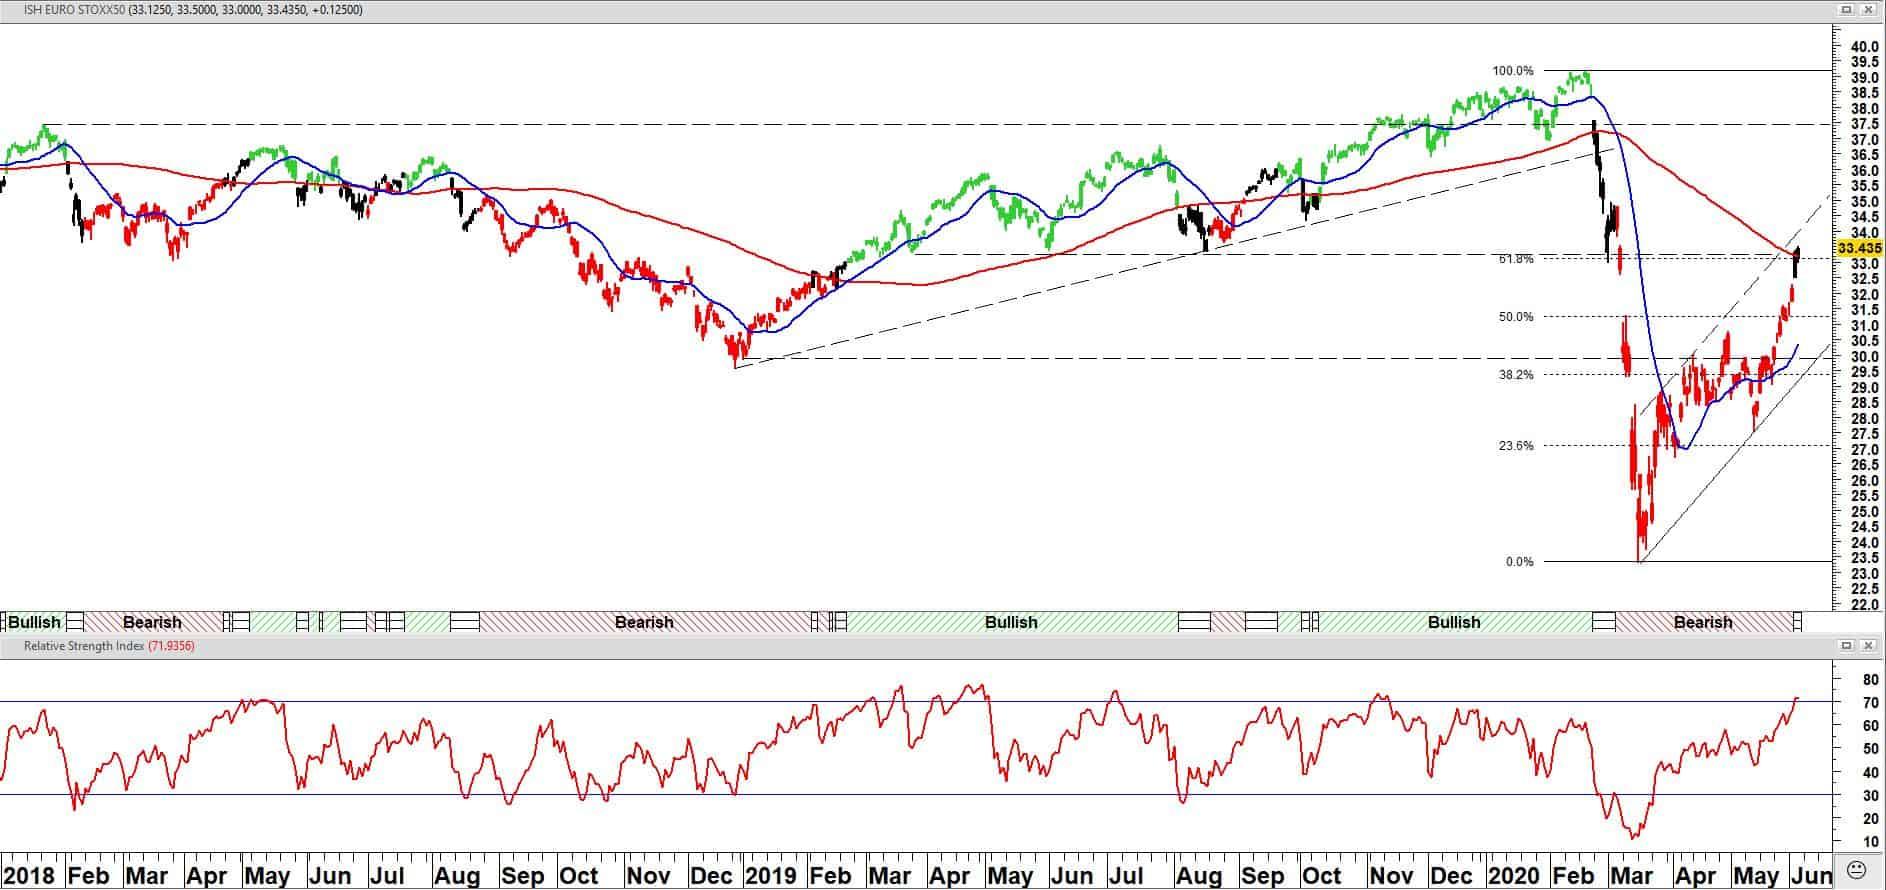 IShares Core Euro Stoxx 50 UCITS ETF EUR (EUEA)